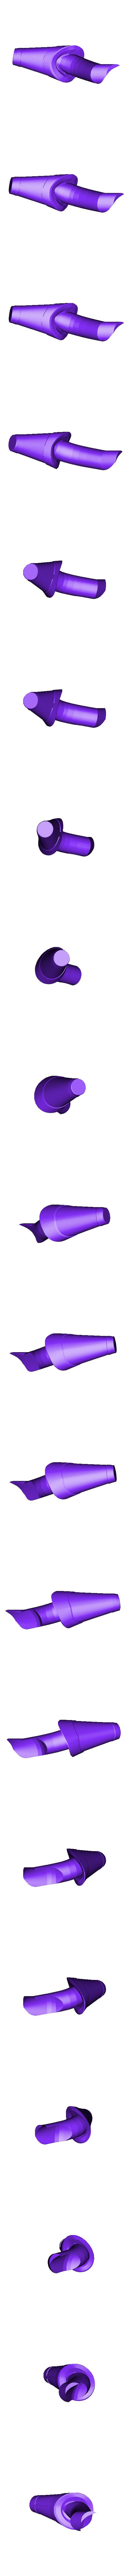 RArm.stl Download STL file Super Witch • 3D print template, amadorcin